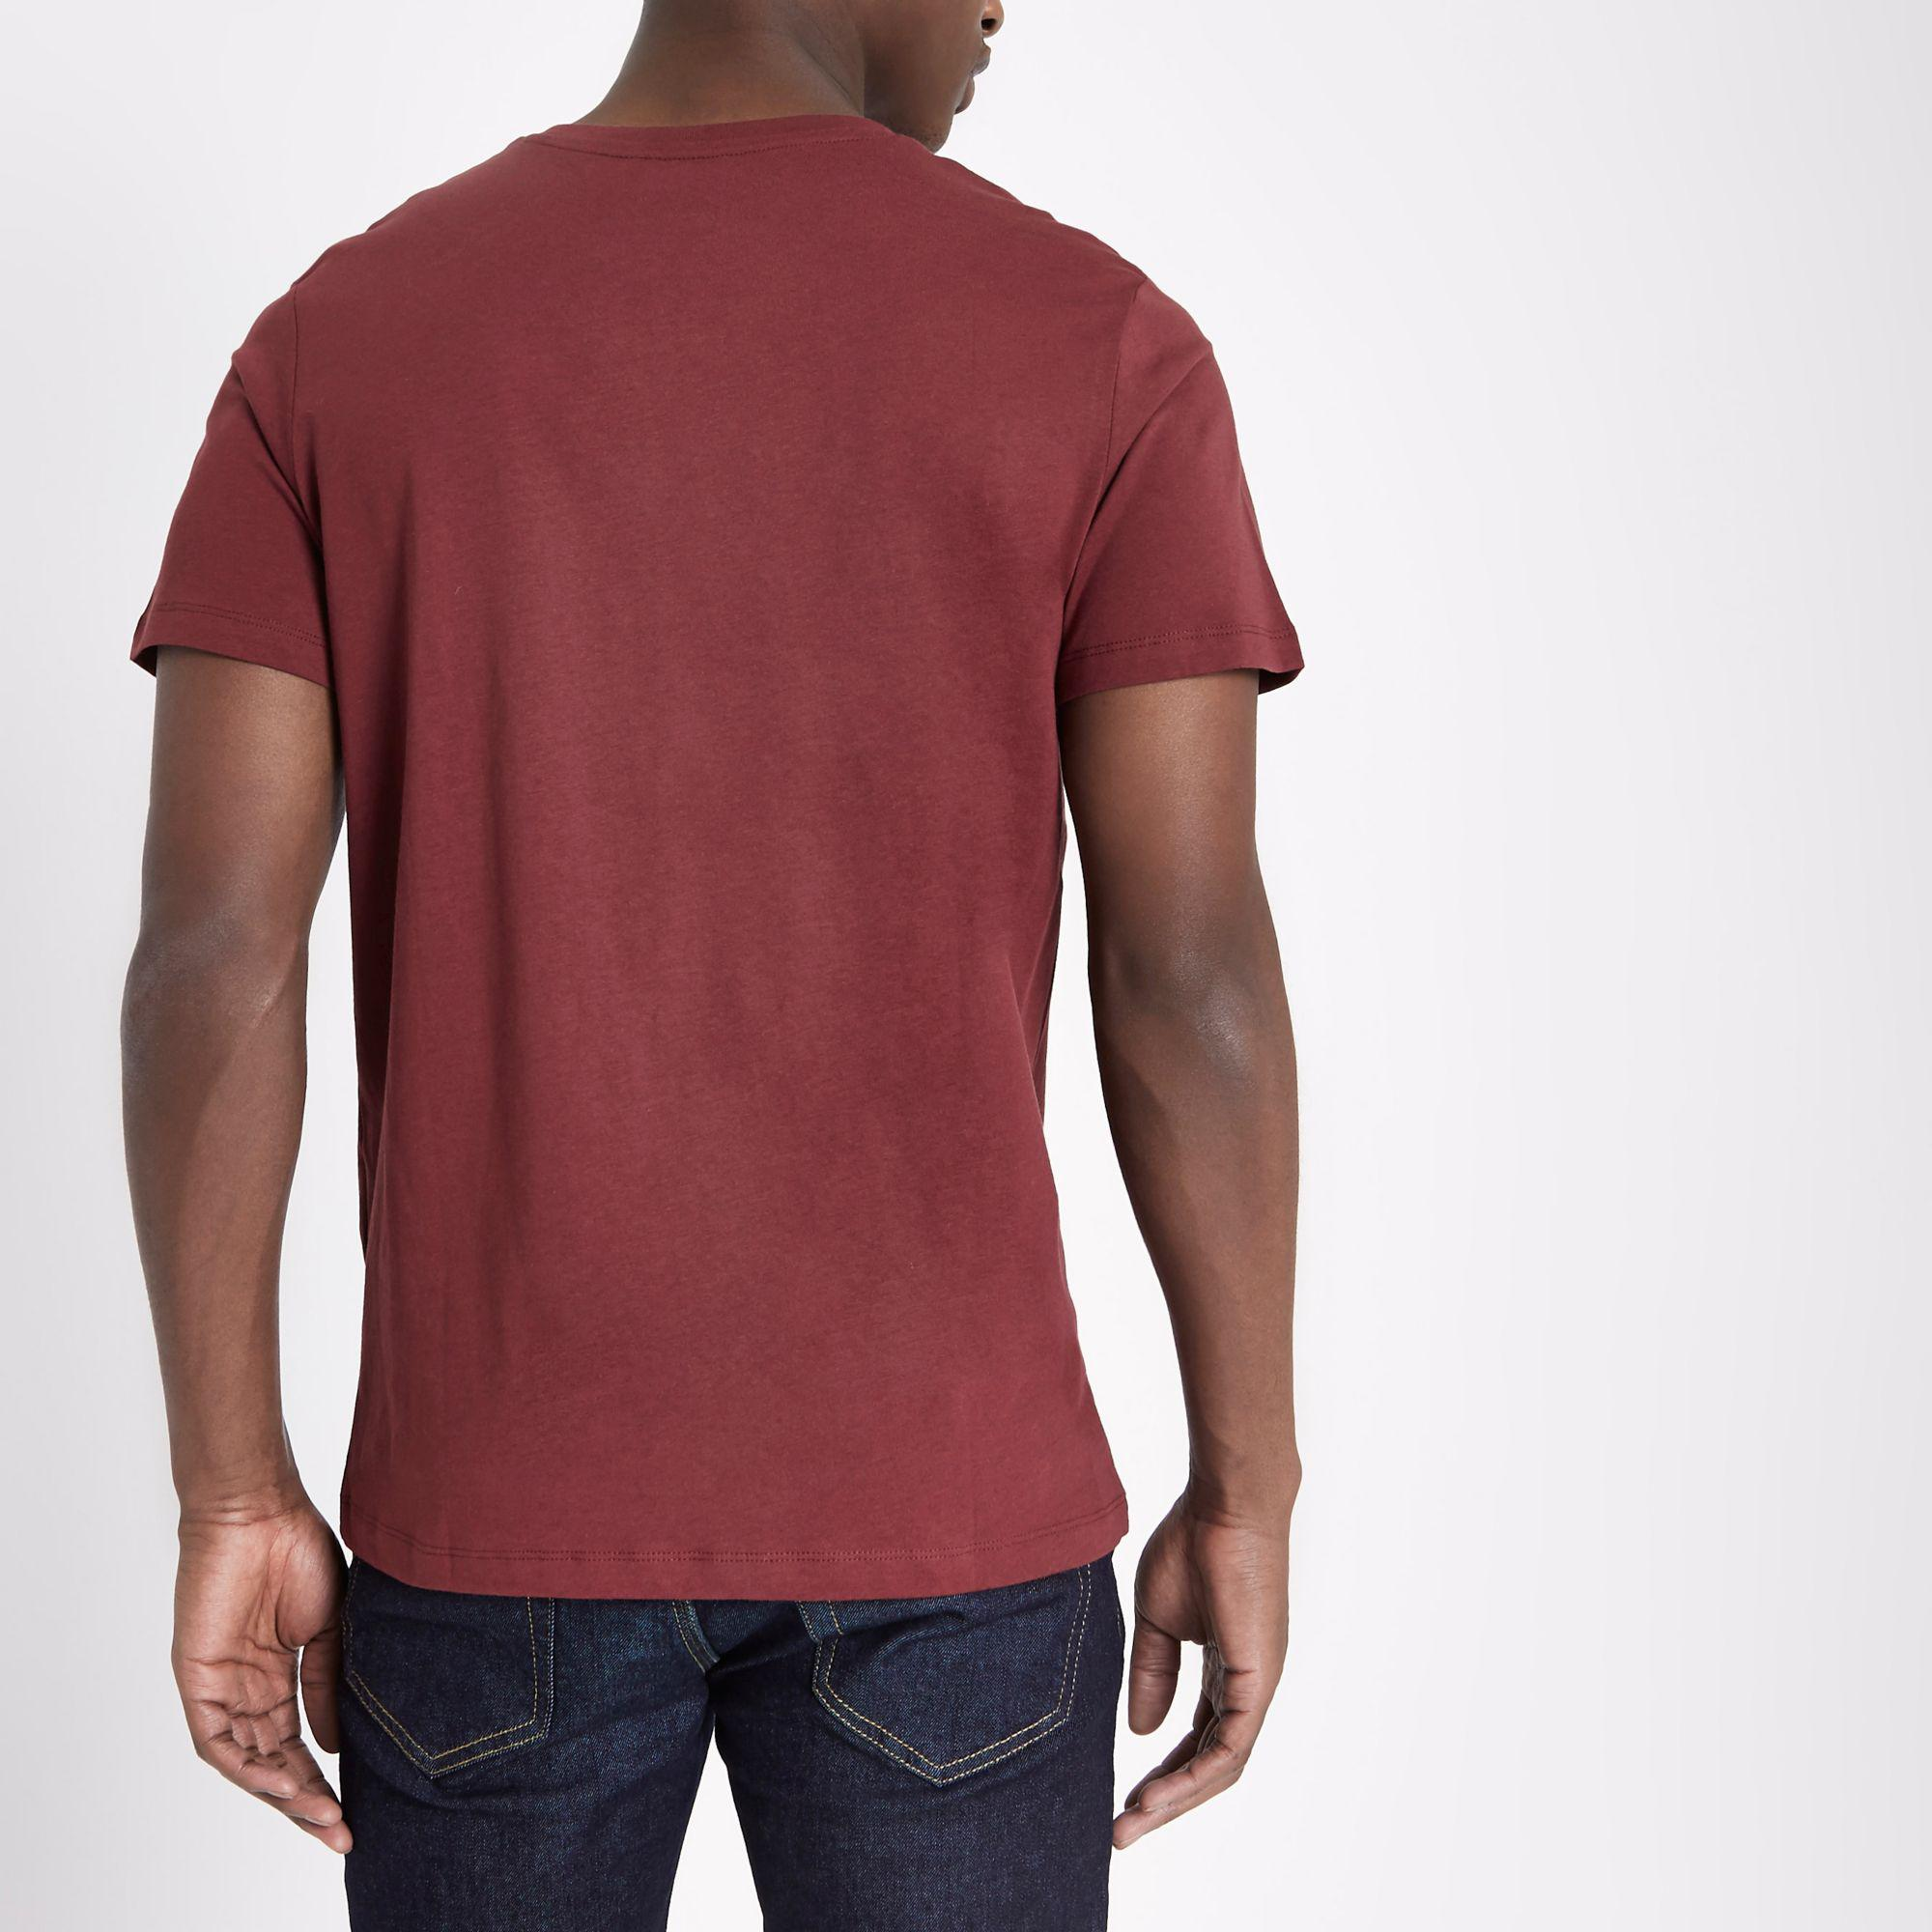 be288c6eb09d Lyst - River Island Jack & Jones Dark Red Short Sleeve T-shirt in ...